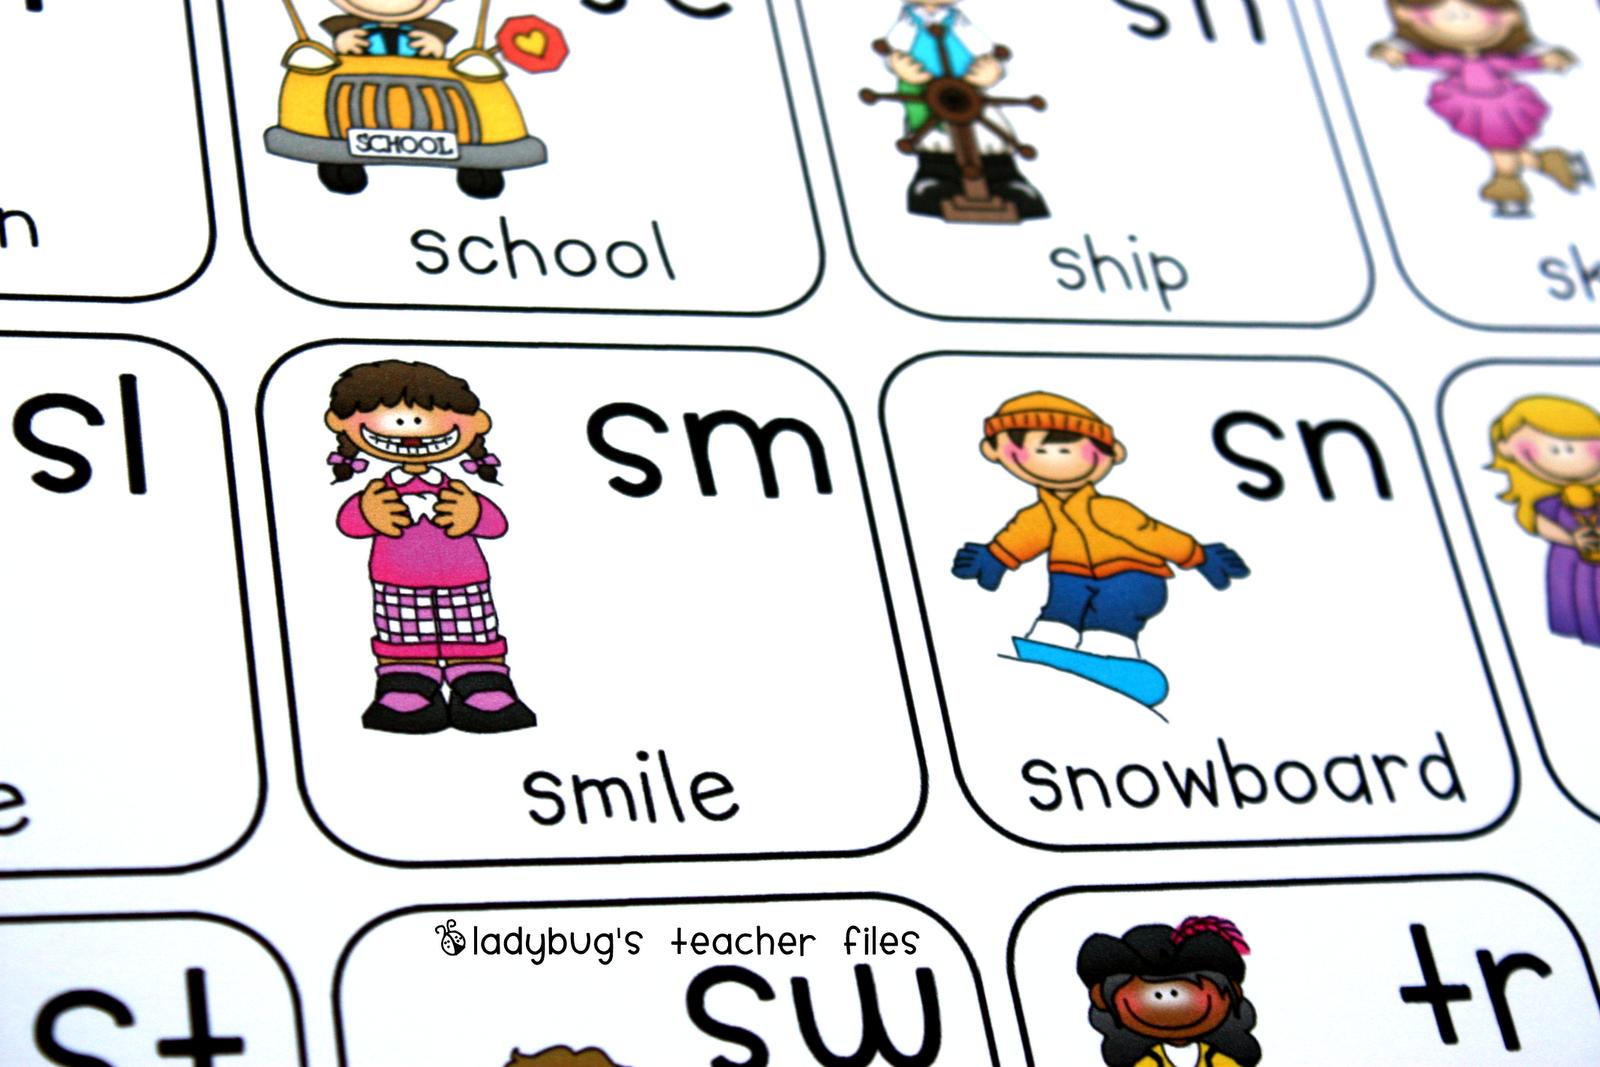 medium resolution of Consonant Blends Chart {printable}   Ladybug's Teacher Files